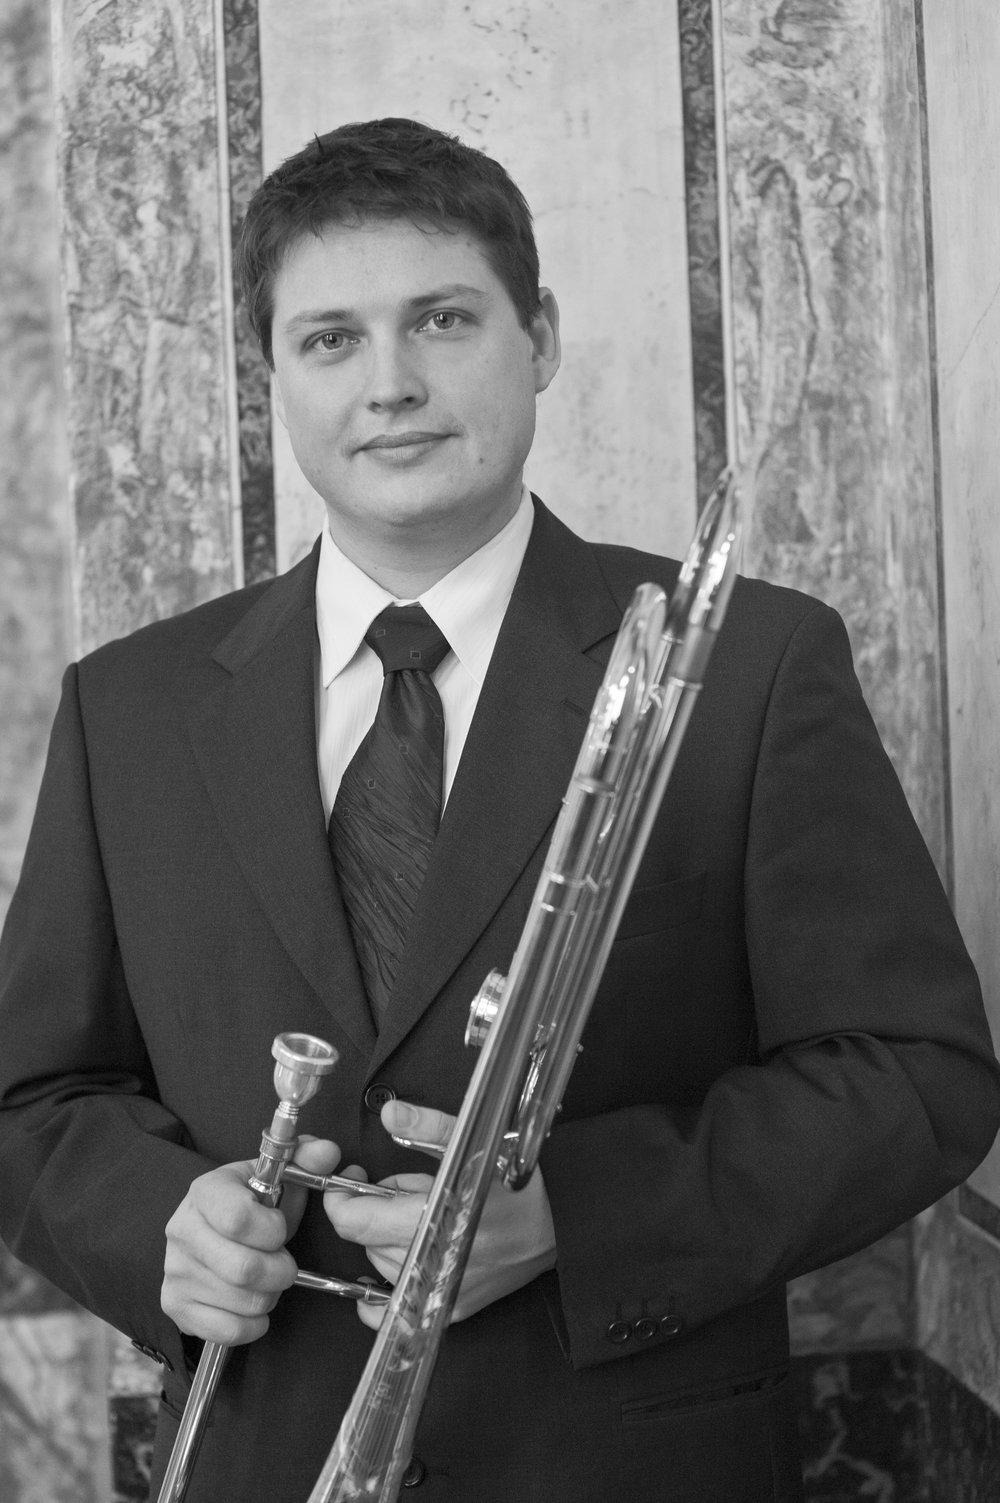 Mihael Šuler - Principal trombone, RTV Slovenia Symphony Orchestra